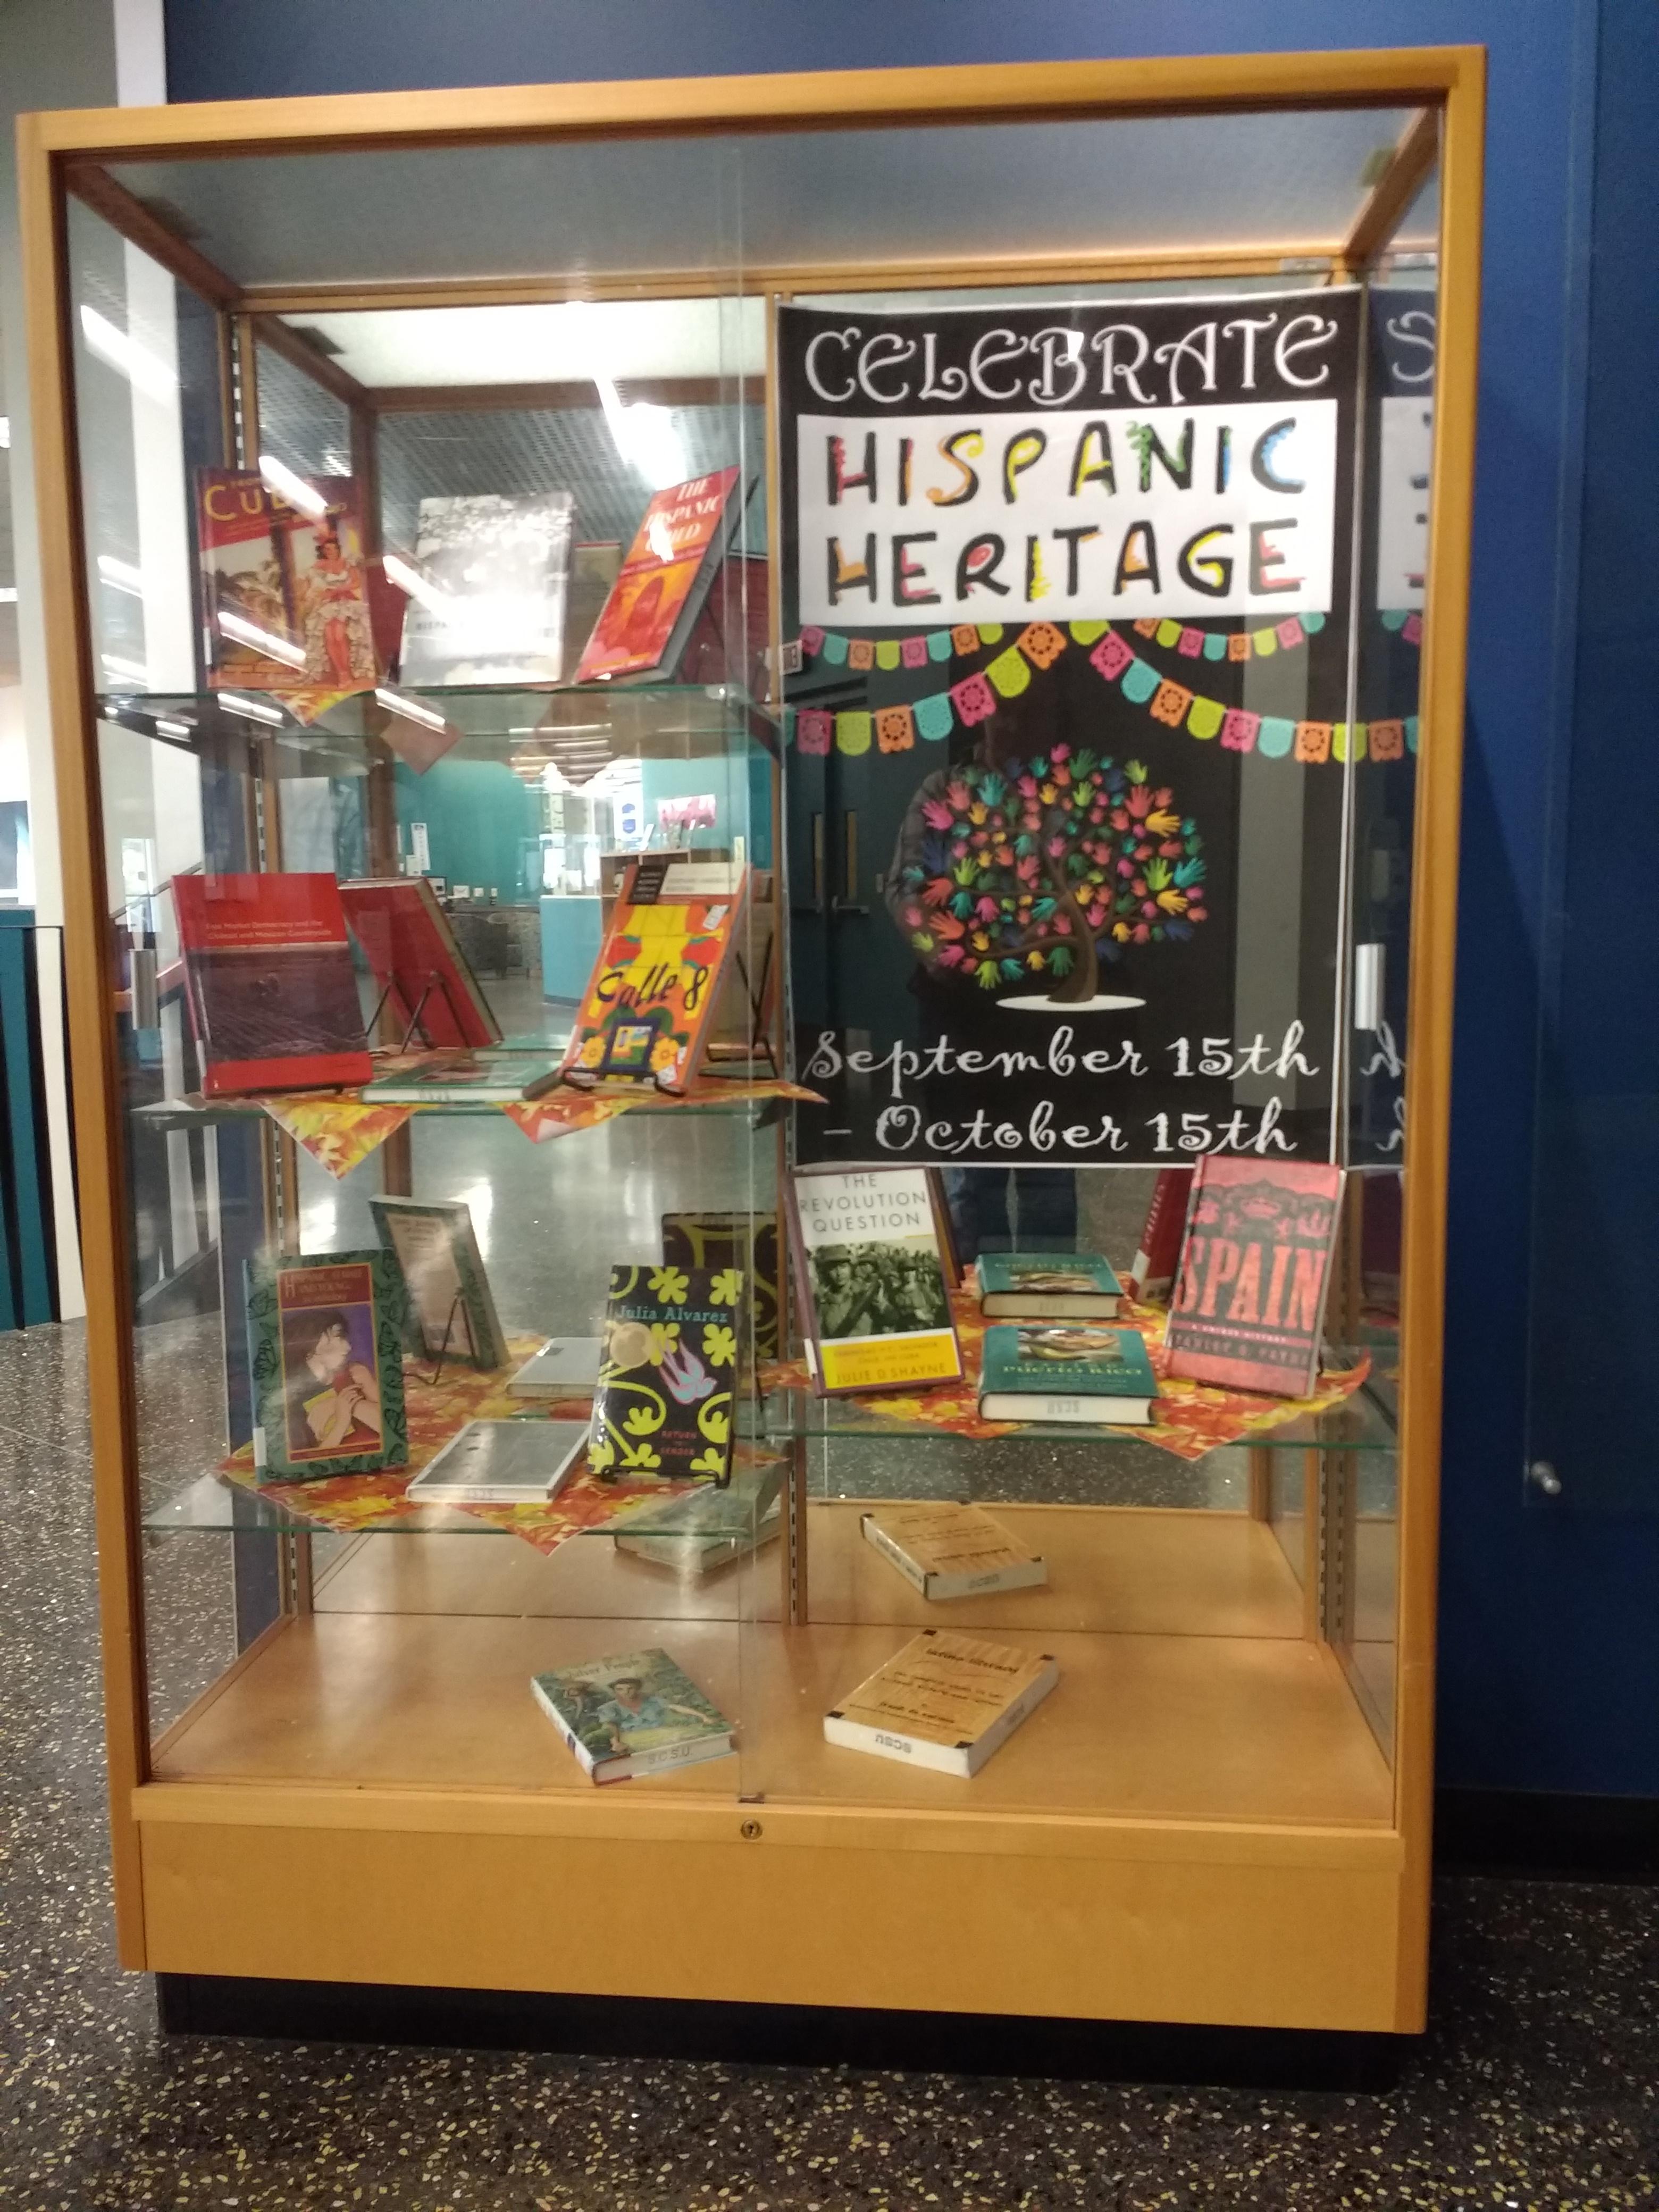 Book display for Hispanic Heritage Month